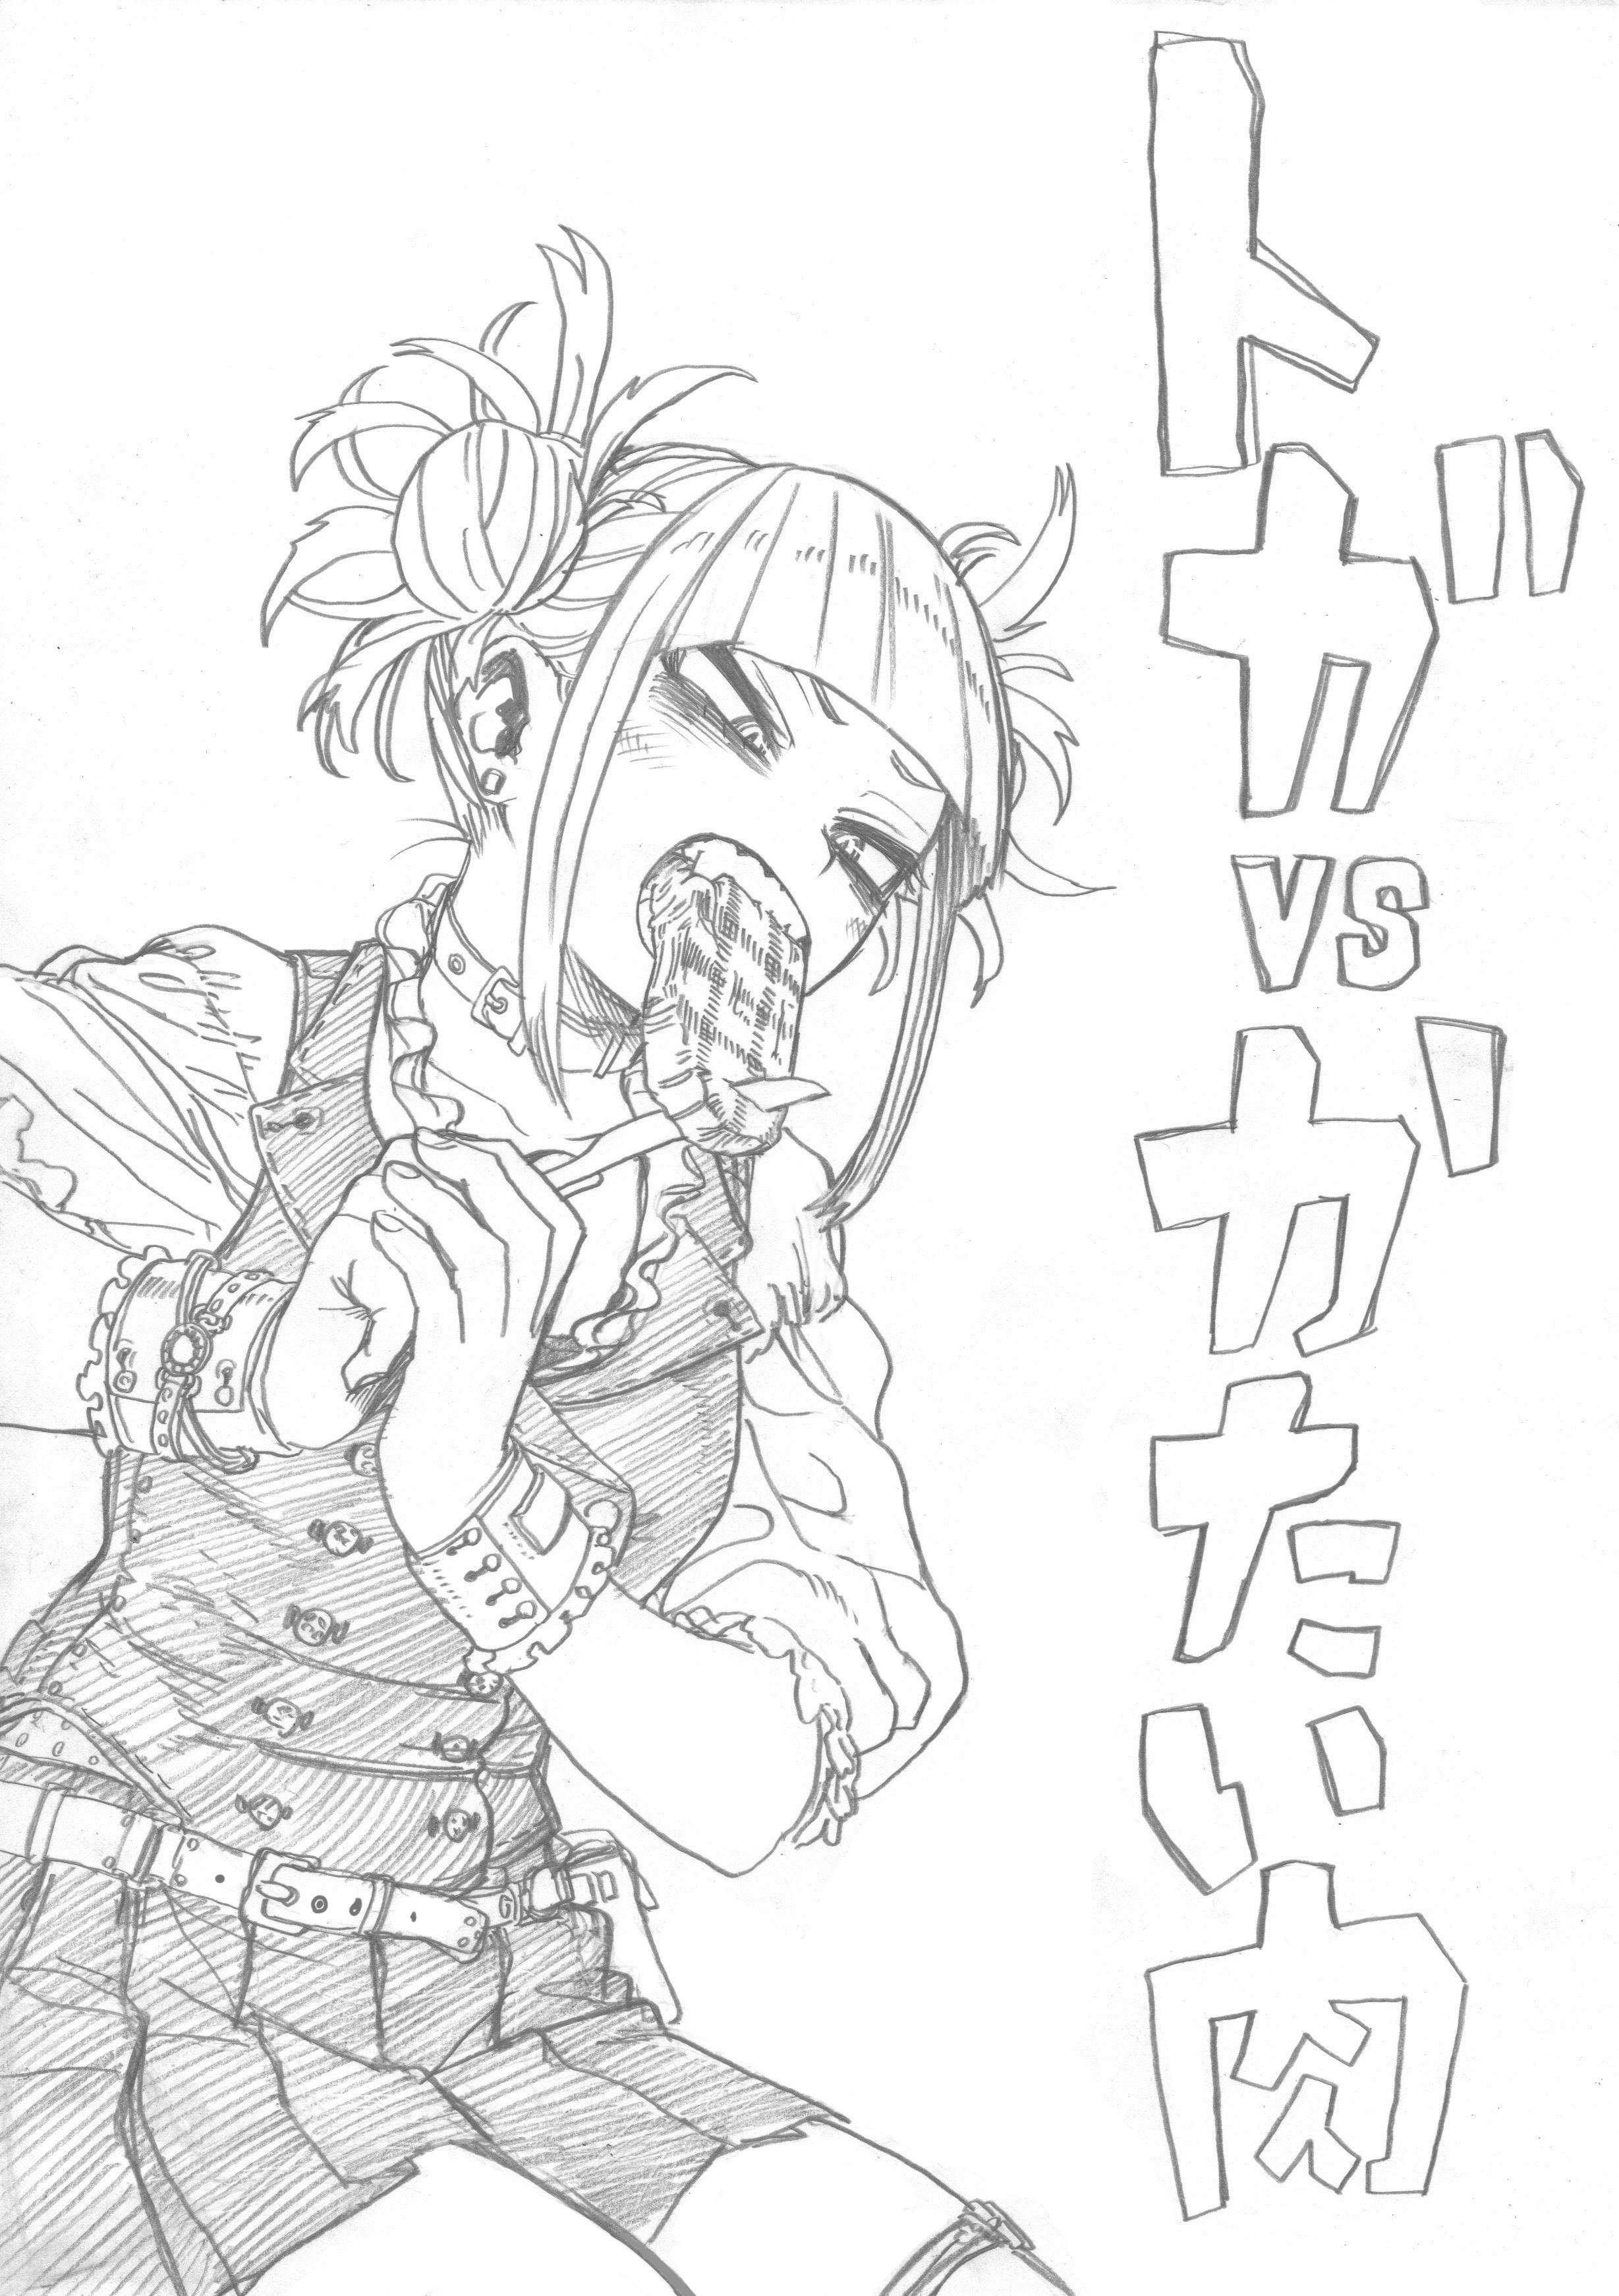 Himiko Toga VS Meat Sketch